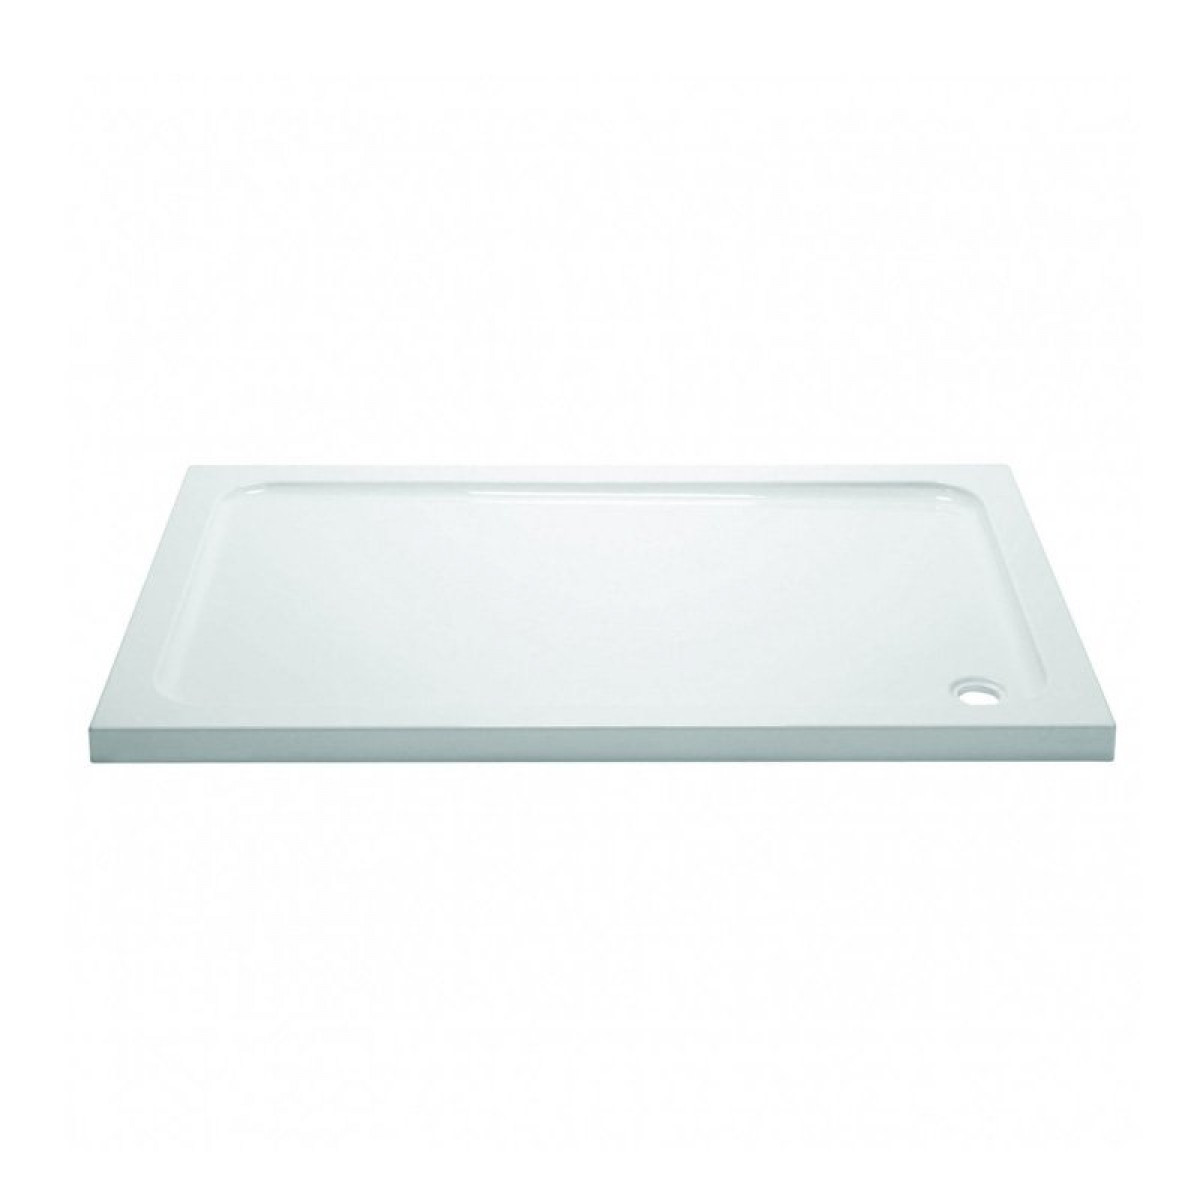 Premium shower trays, riser kits and wetroom flooring